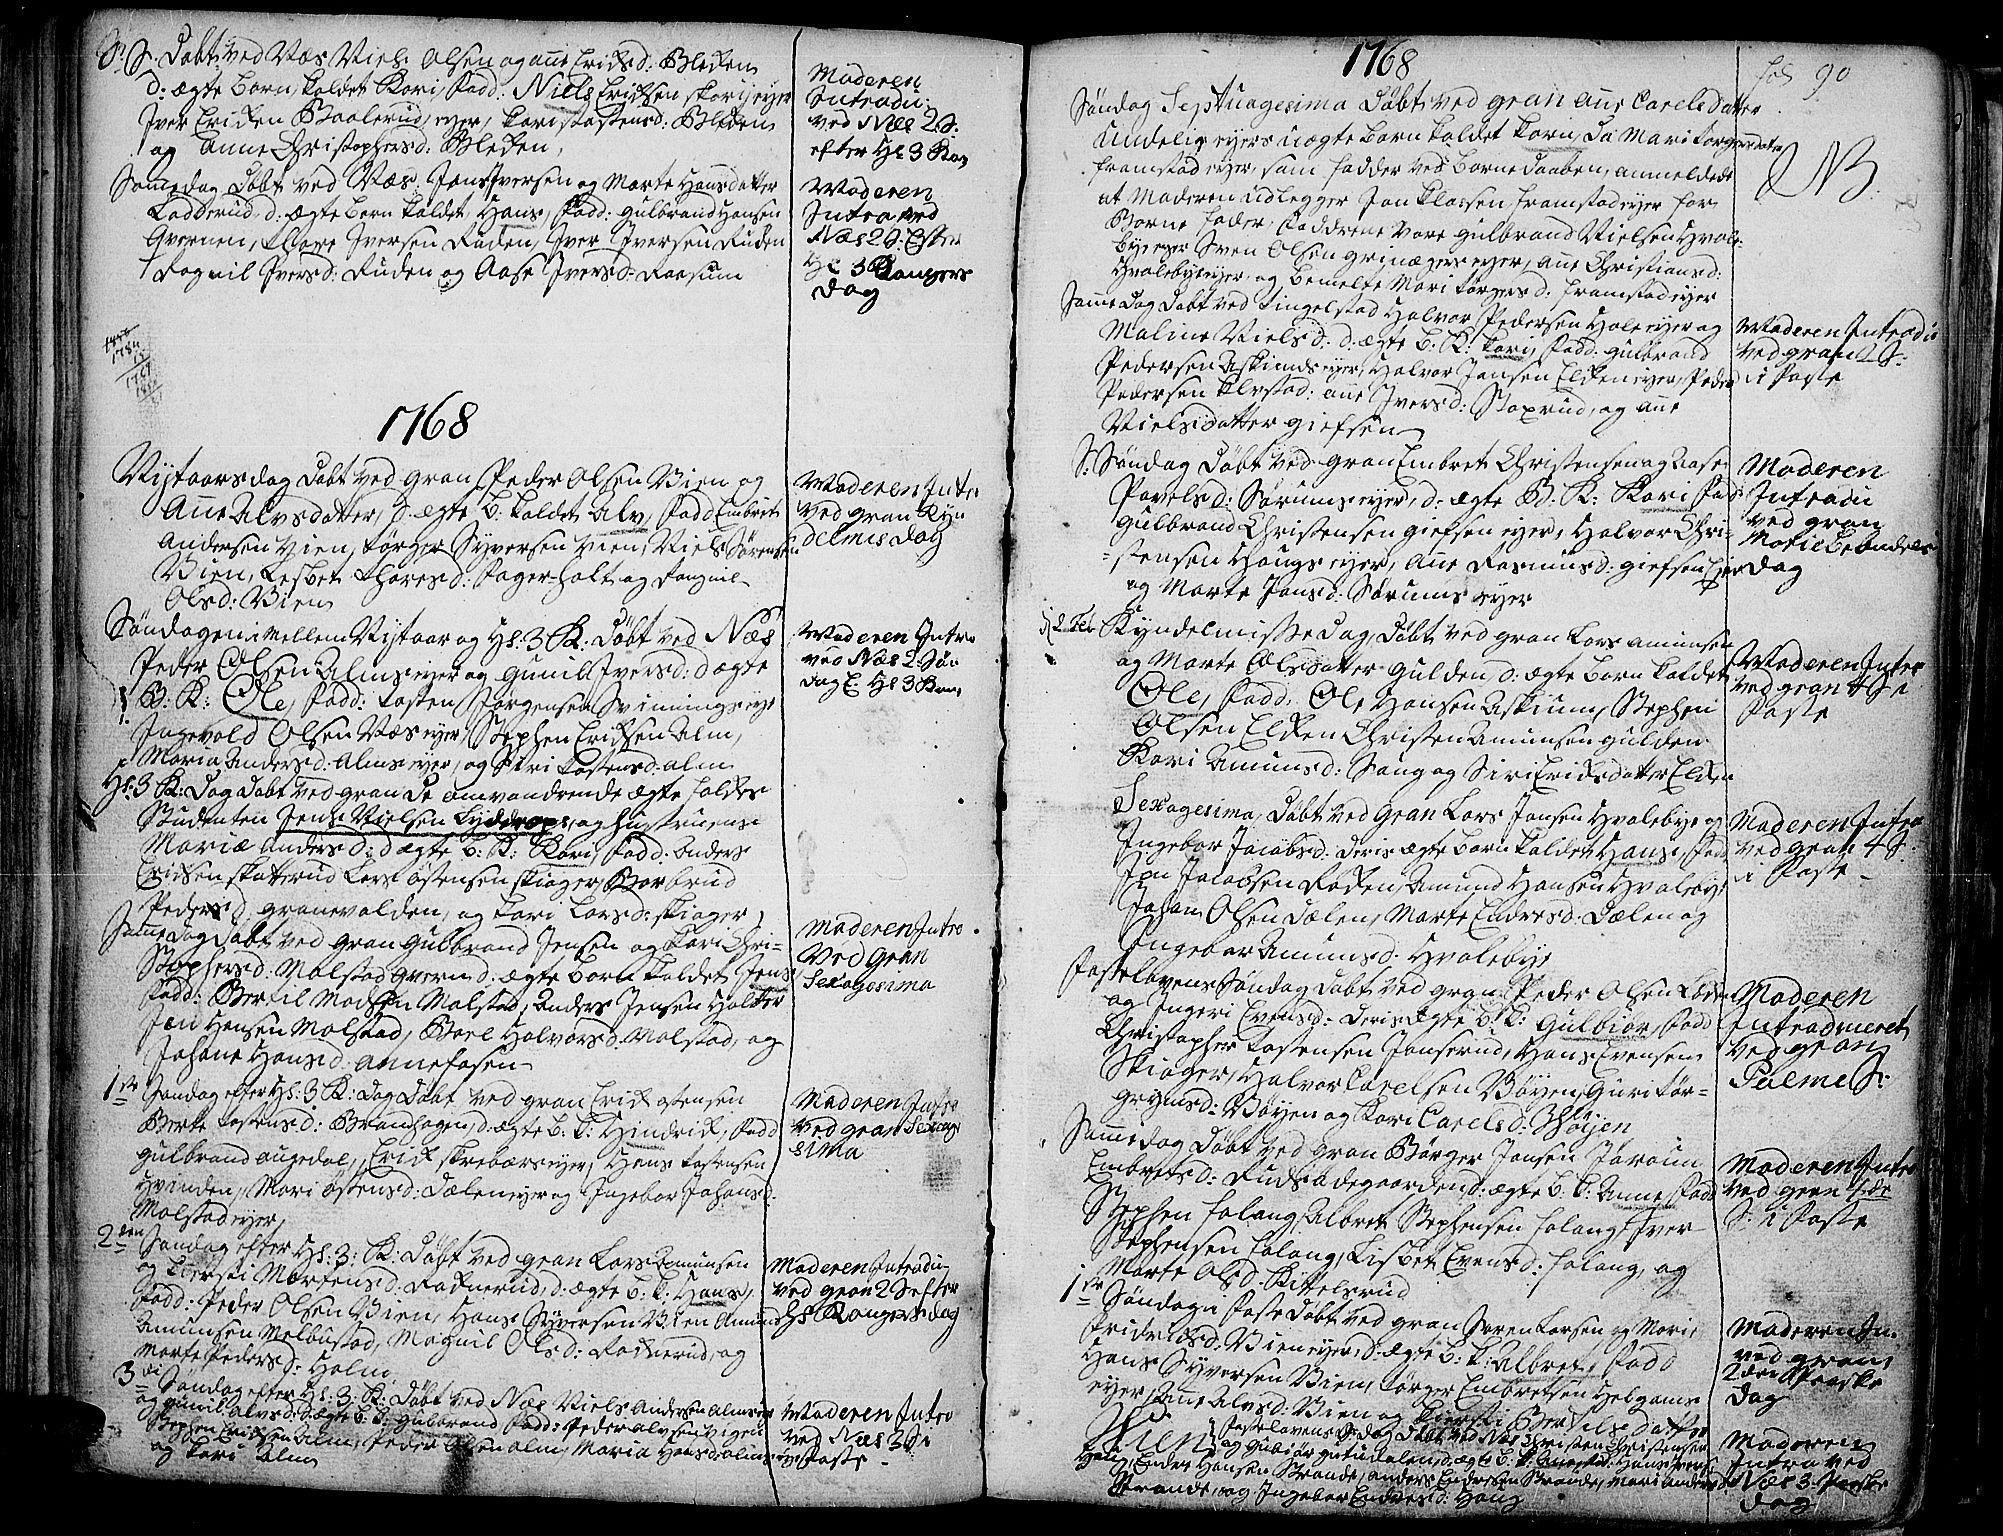 SAH, Gran prestekontor, Ministerialbok nr. 4, 1759-1775, s. 90